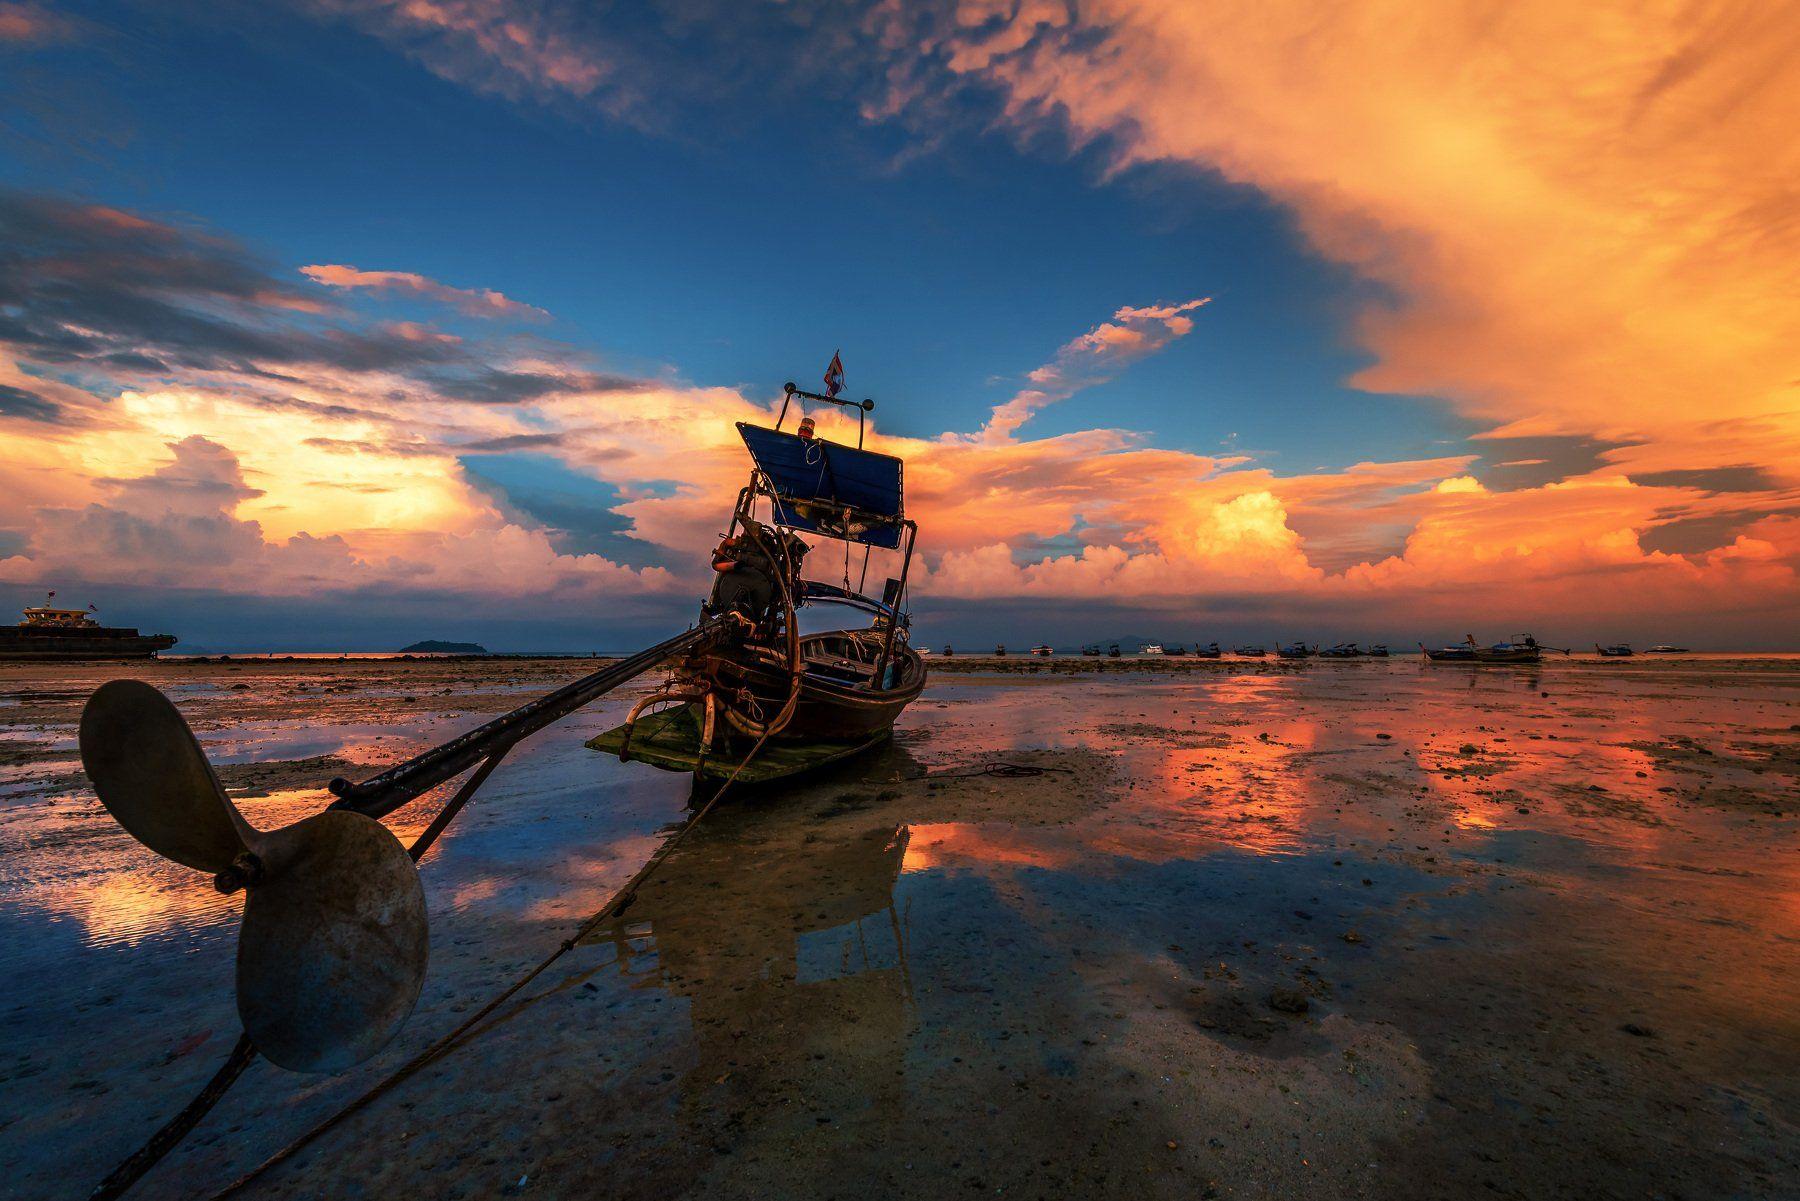 sunset, longtail boat,landscape, sea, water,clouds, sky, orange, fire, Jeni Madjarova